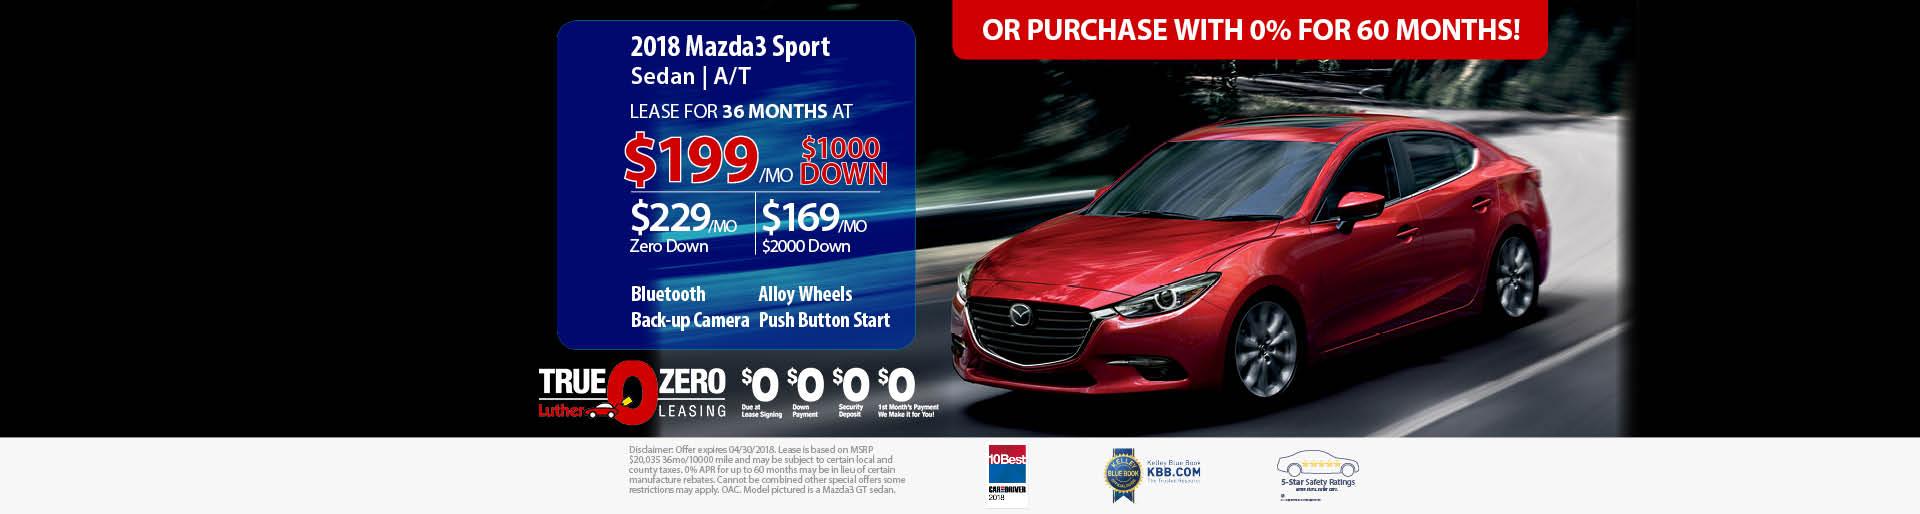 Luther Mazda New Mazda Dealership In Brooklyn Center Mn 55429